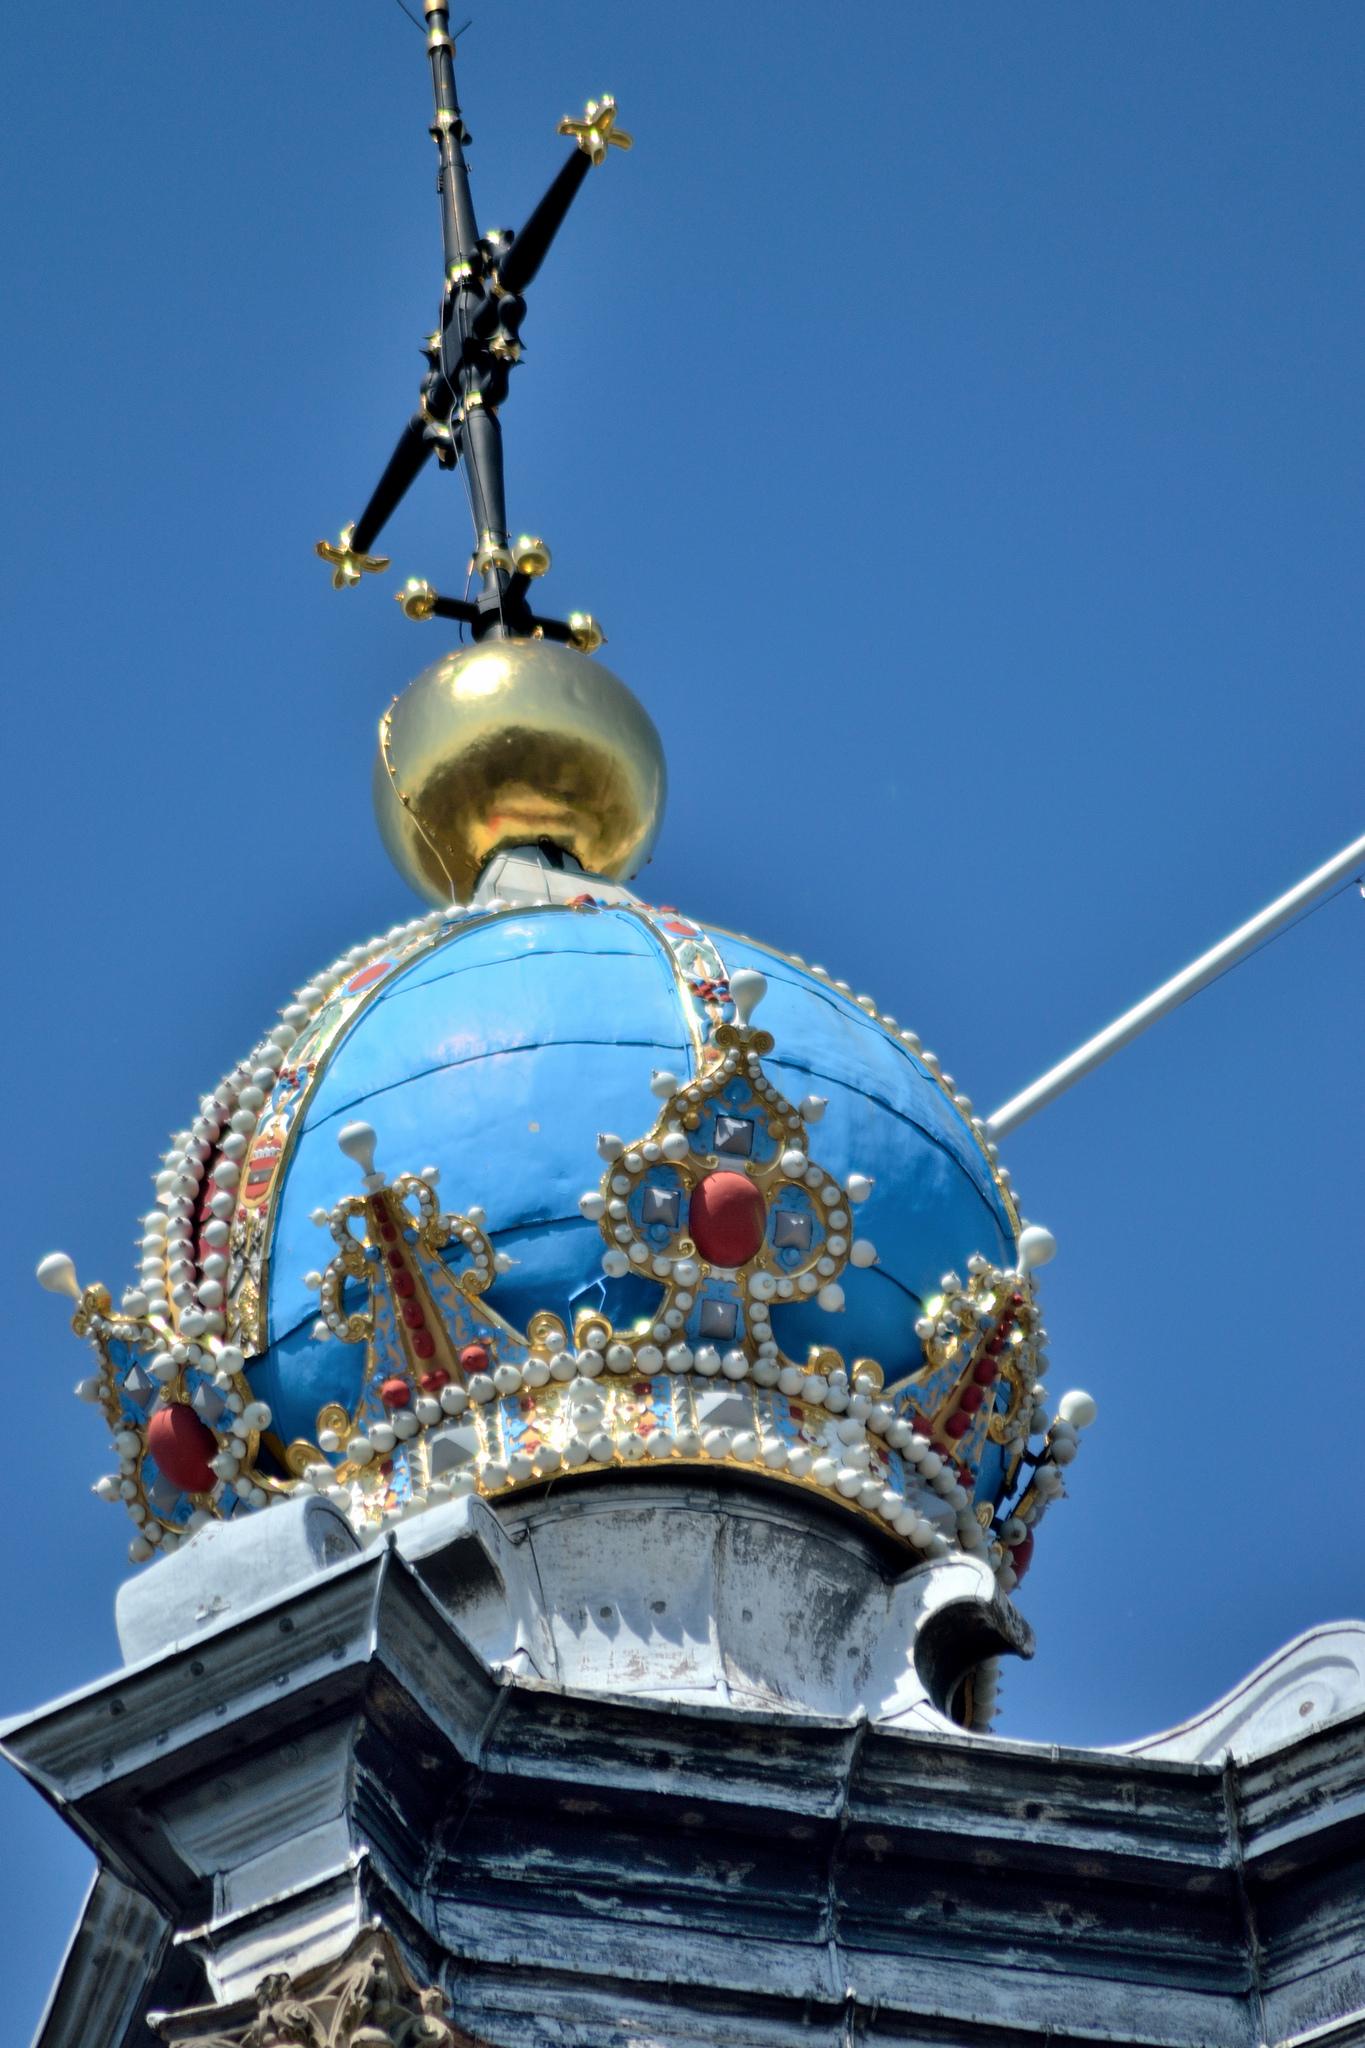 Вестеркерк, модель короны Австрийской империи на верхушке башни